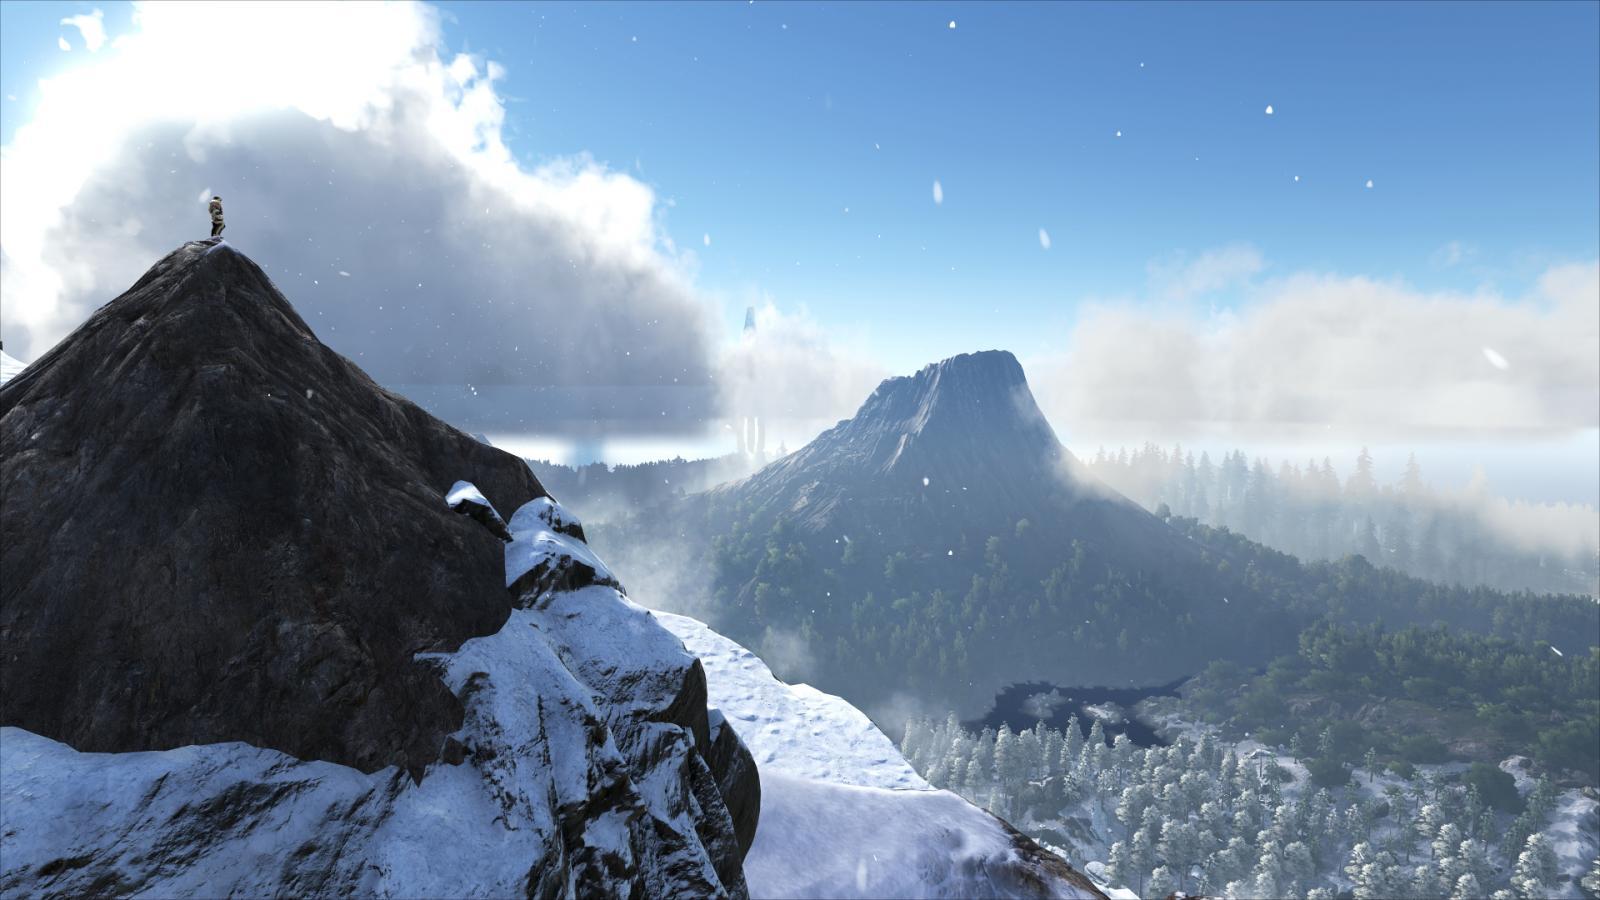 large.598e538e8da58_FataL1ty-SnowPatrol-8x.jpg